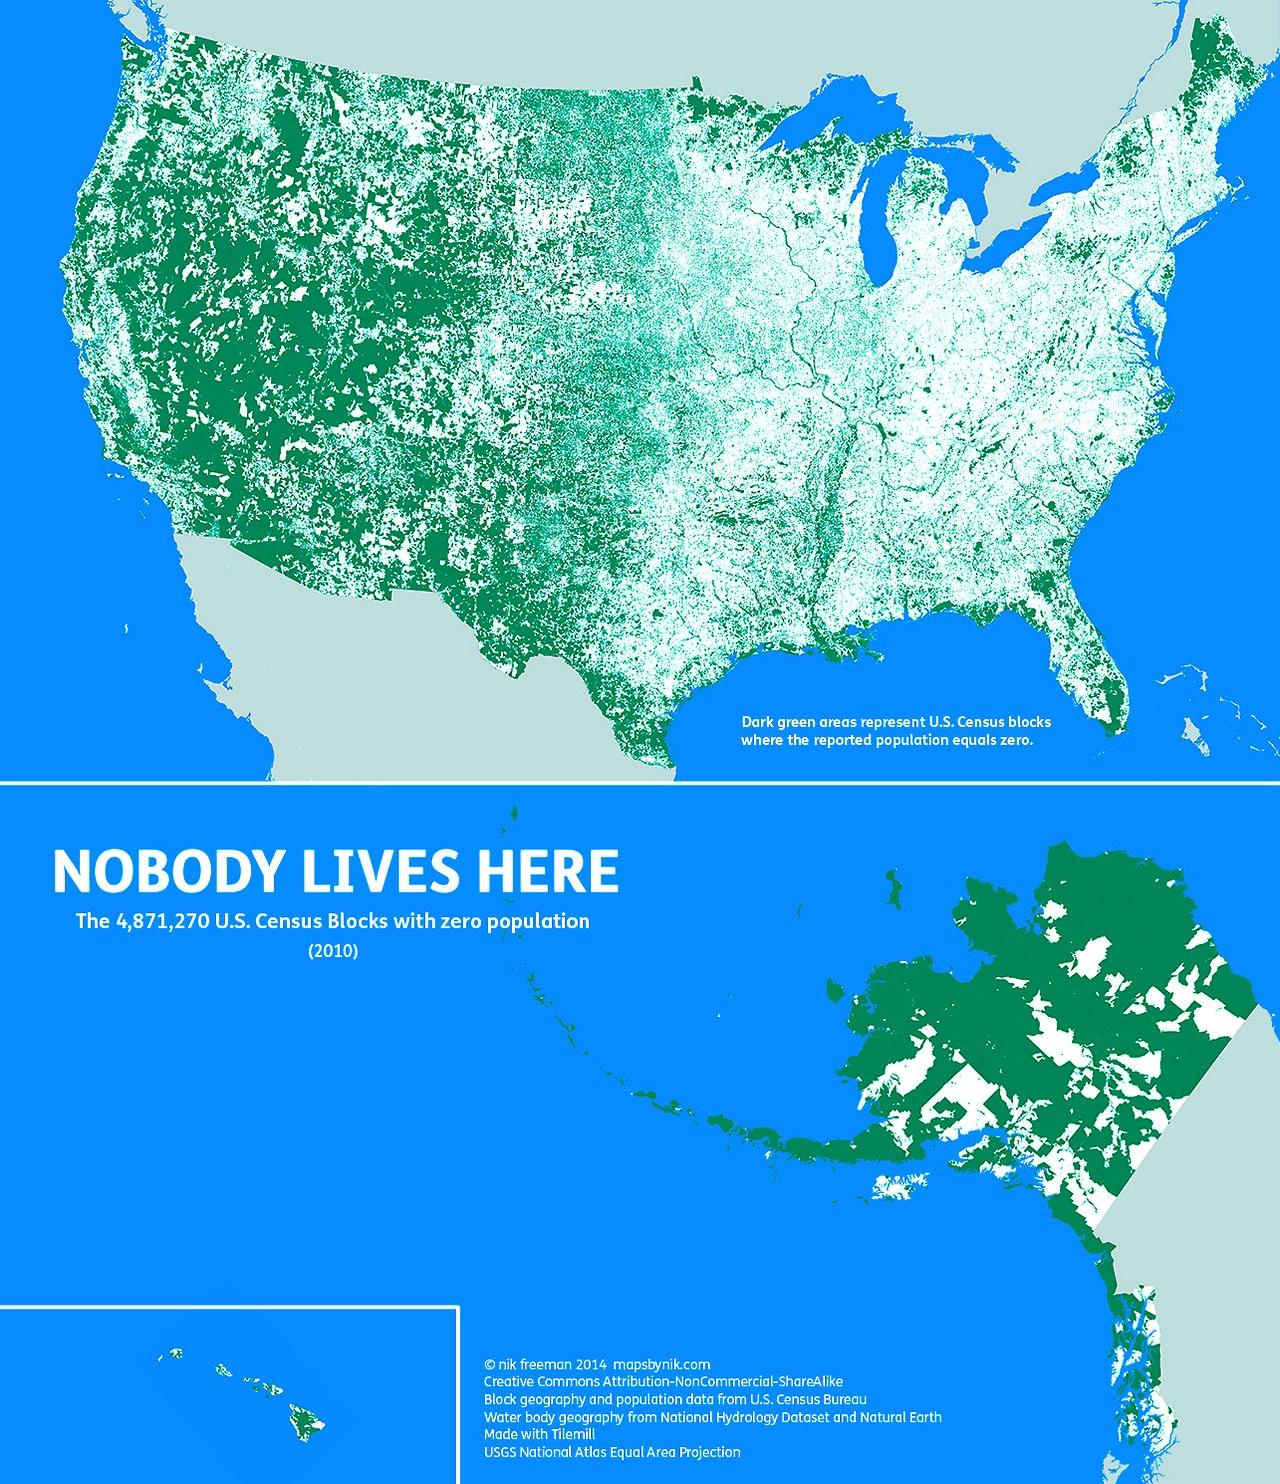 image: maps by nik